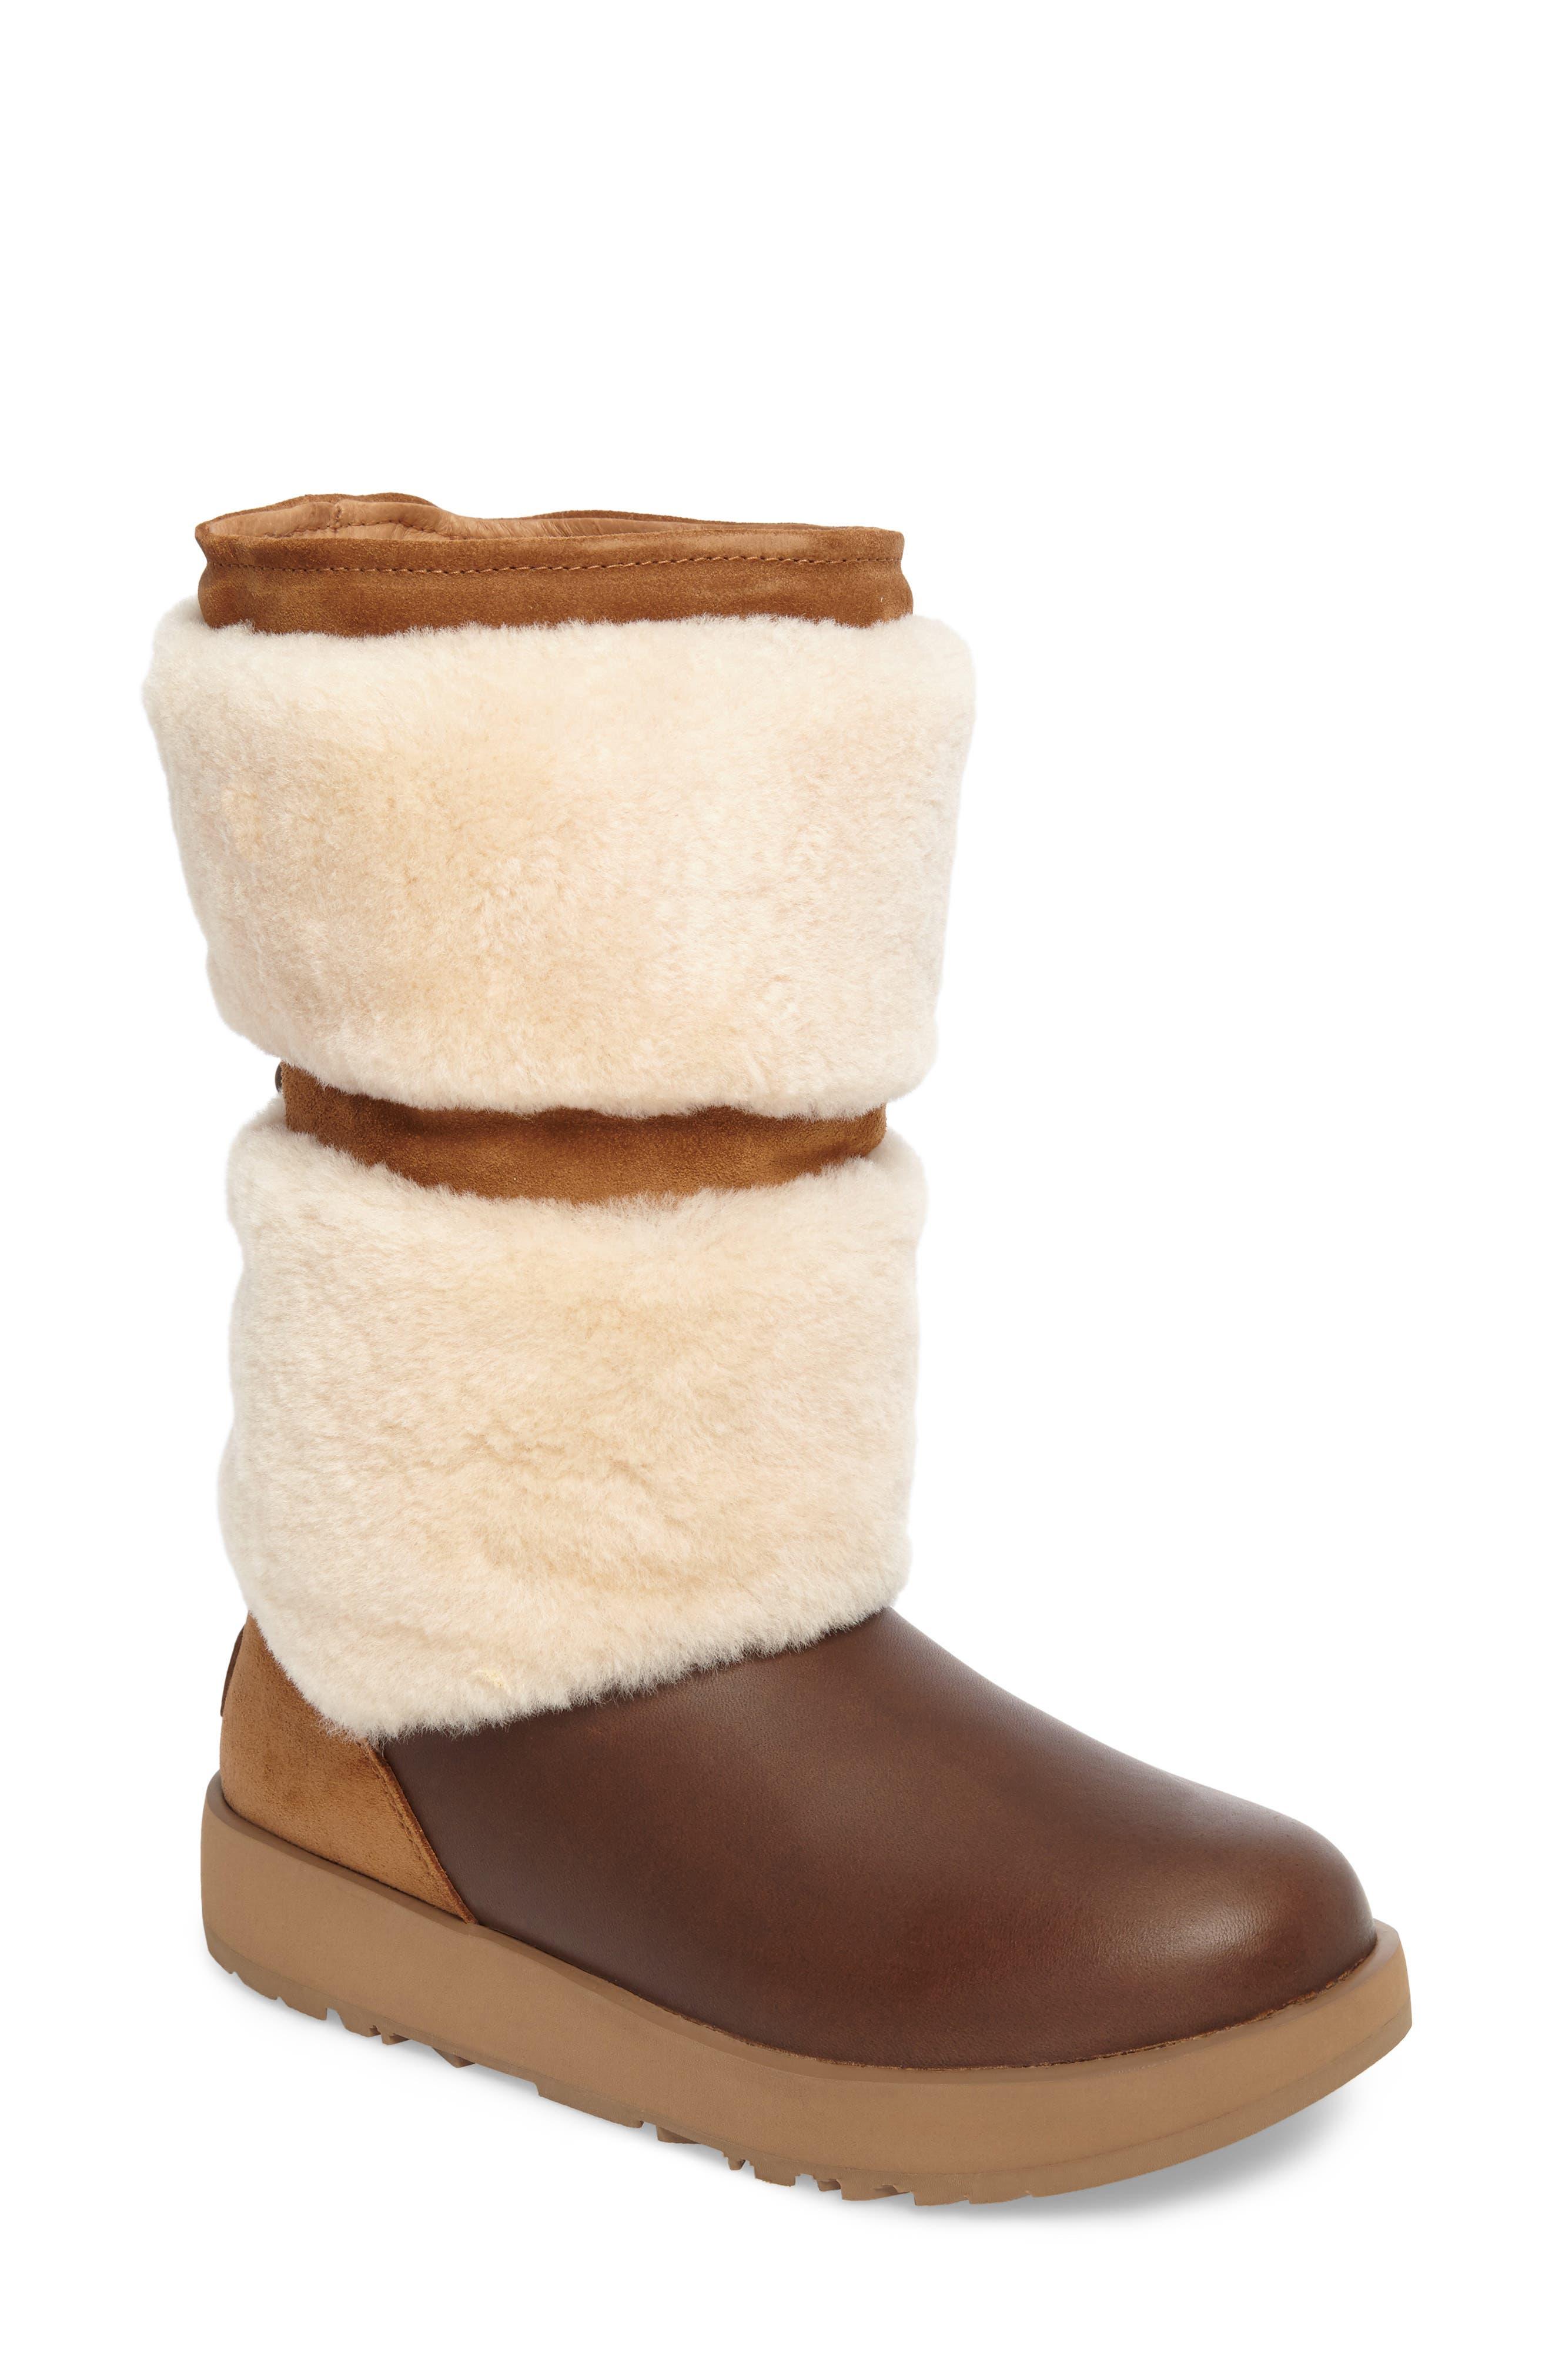 Reykir Waterproof Snow Boot,                             Main thumbnail 3, color,